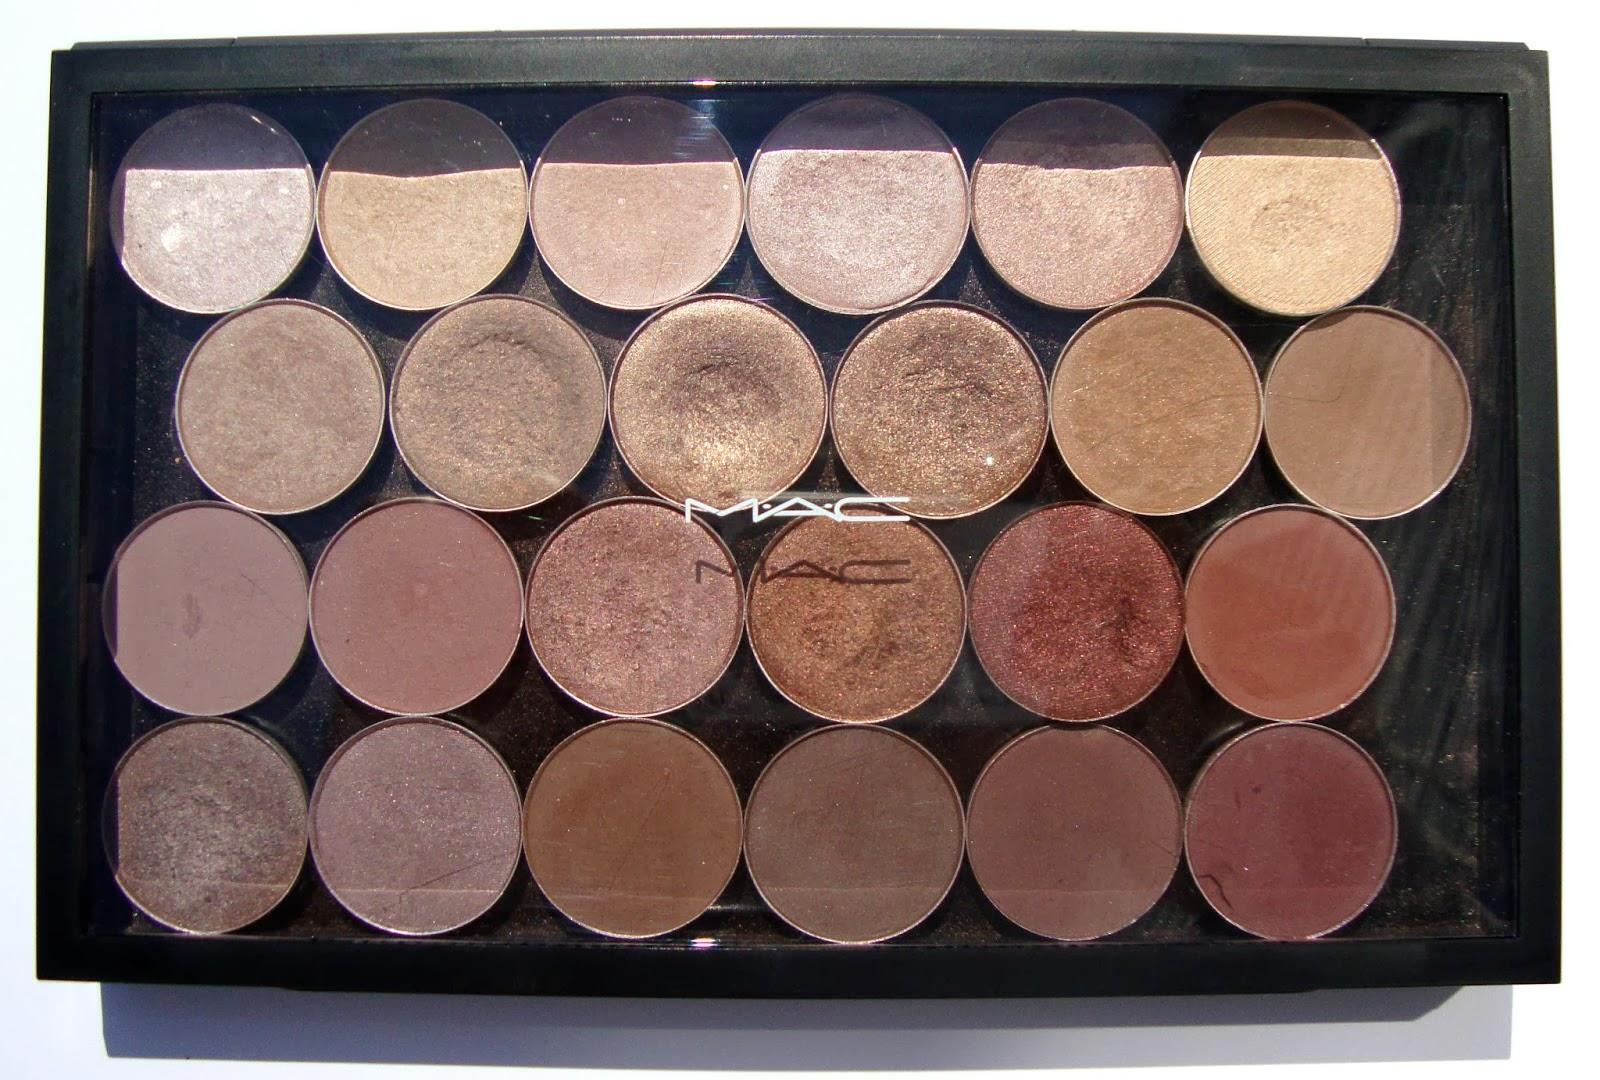 Краски для лица. Тени M.A.C. Cosmetics: ОДЕВАЙСЯ ЛЕГКО